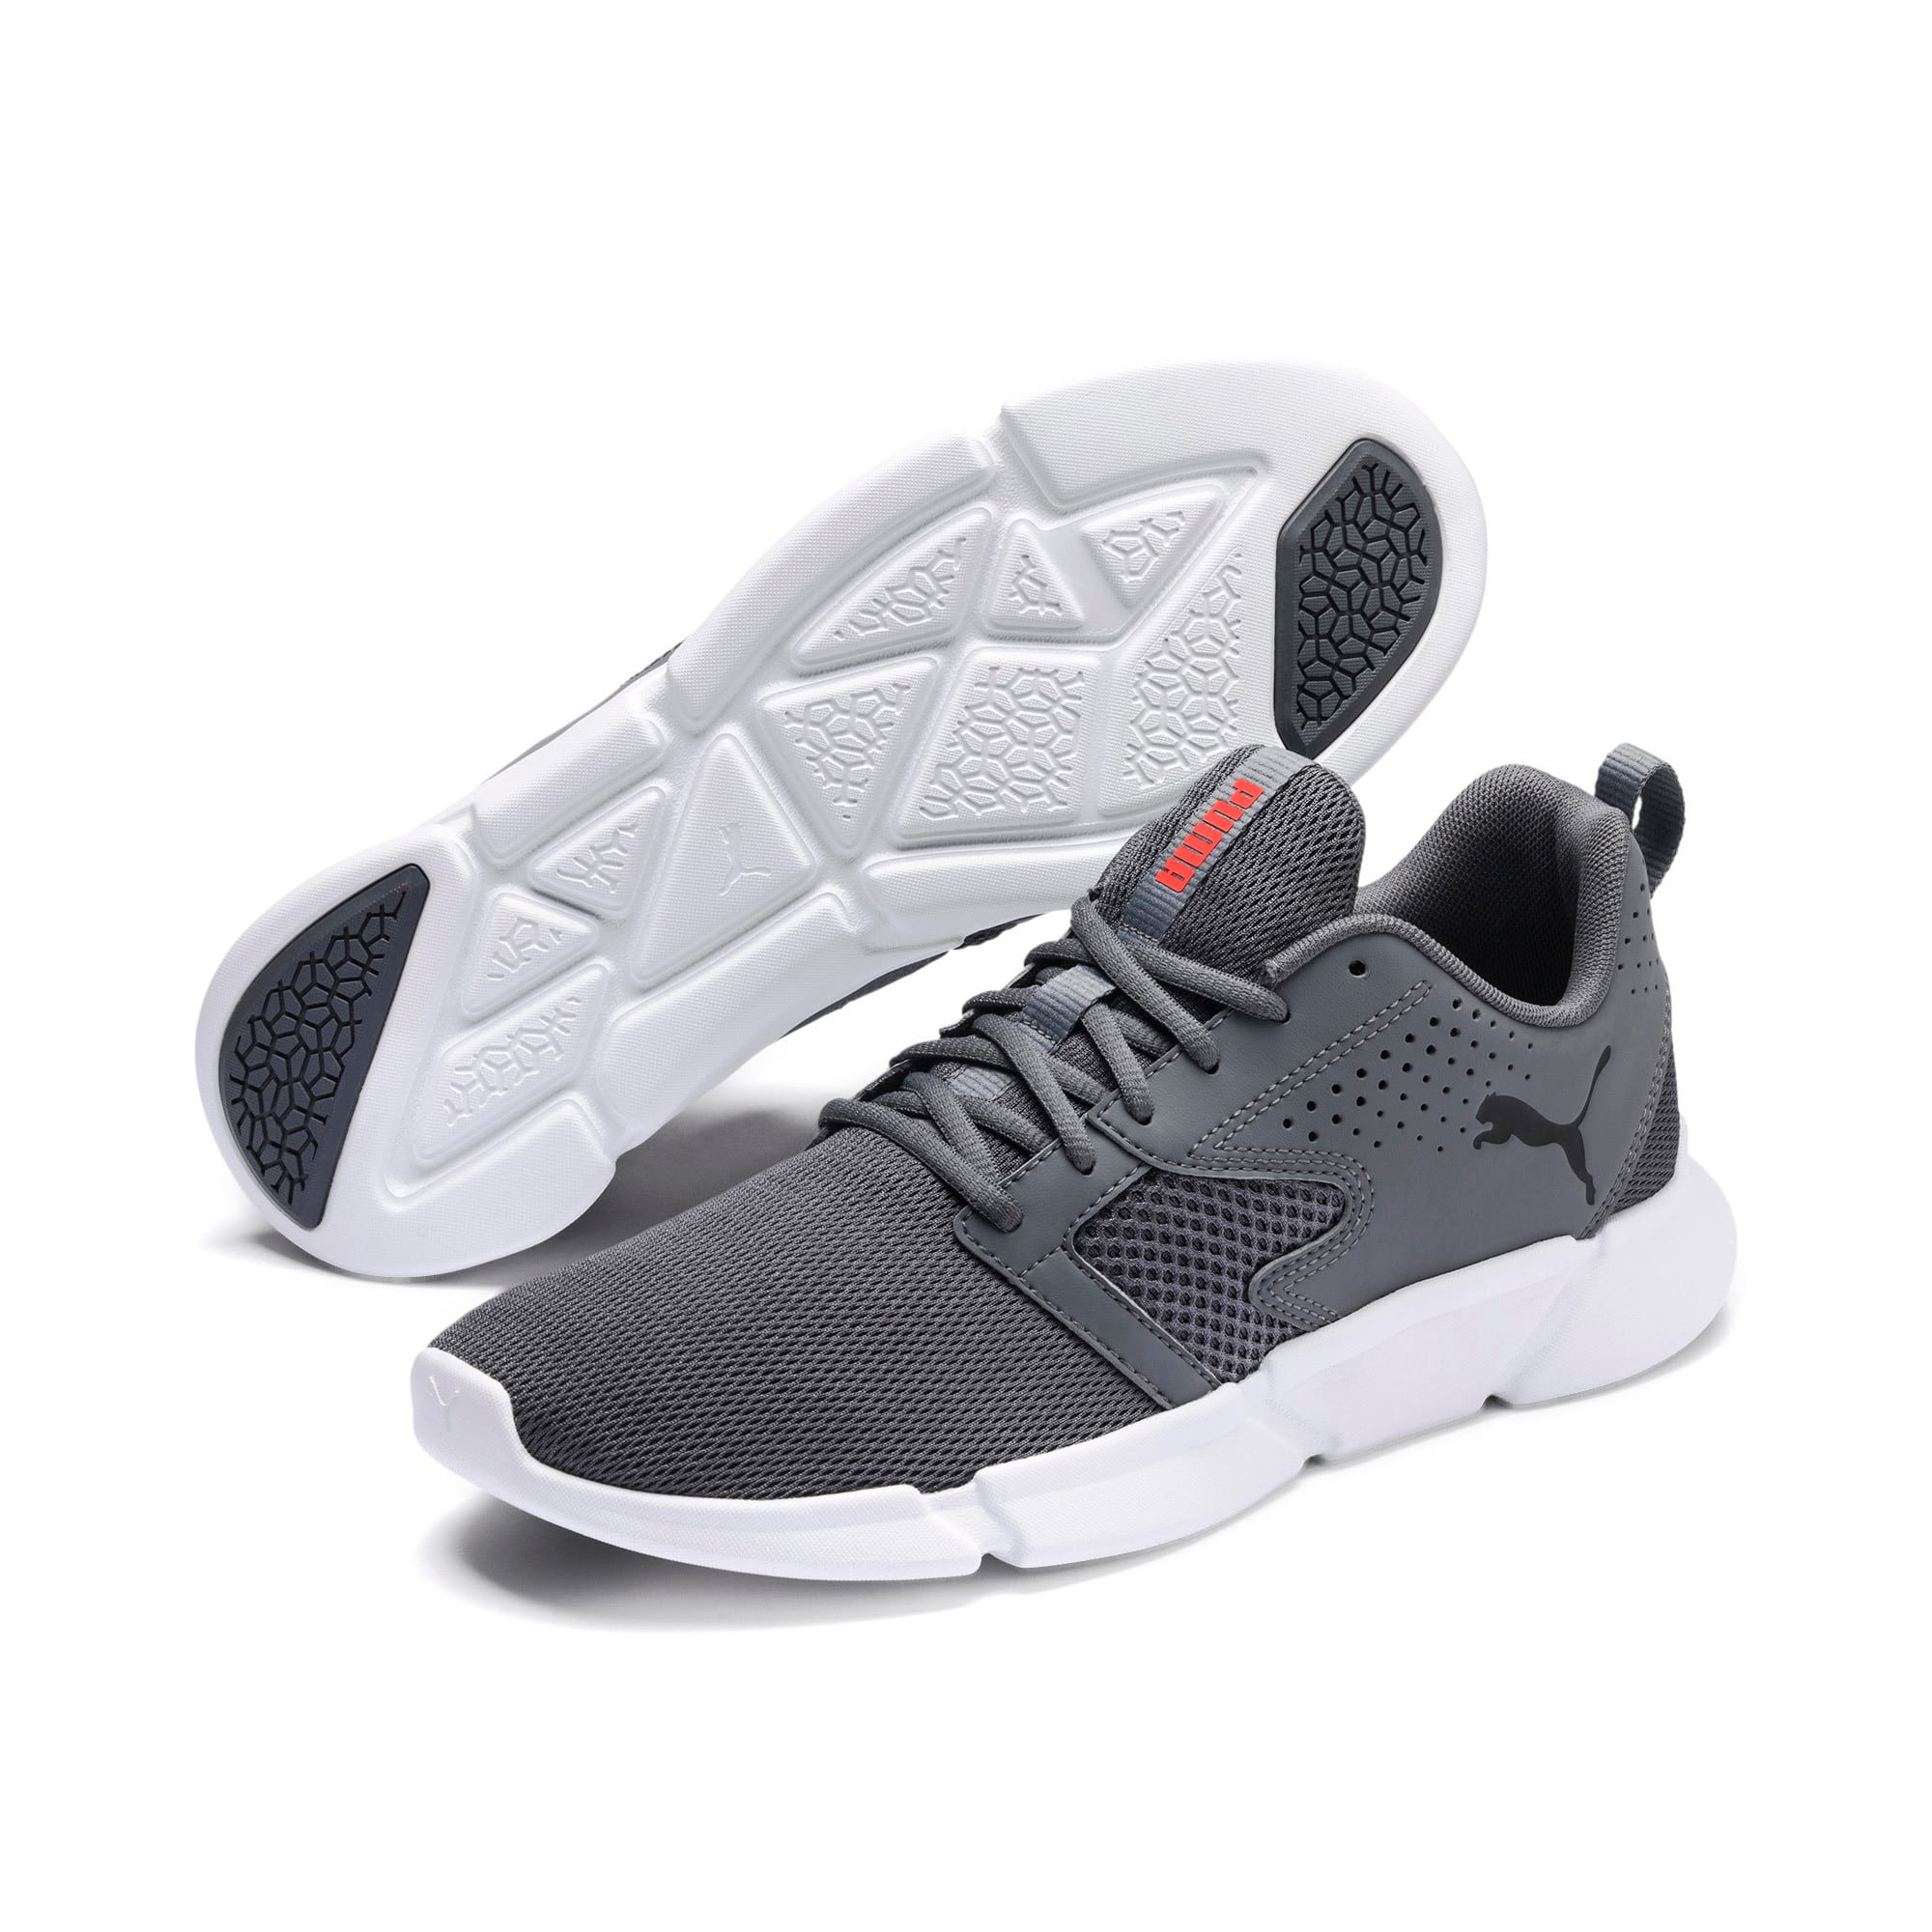 Thumbnail 2 of INTERFLEX Modern Sneakers, CASTLEROCK-Black-Nrgy Red, medium